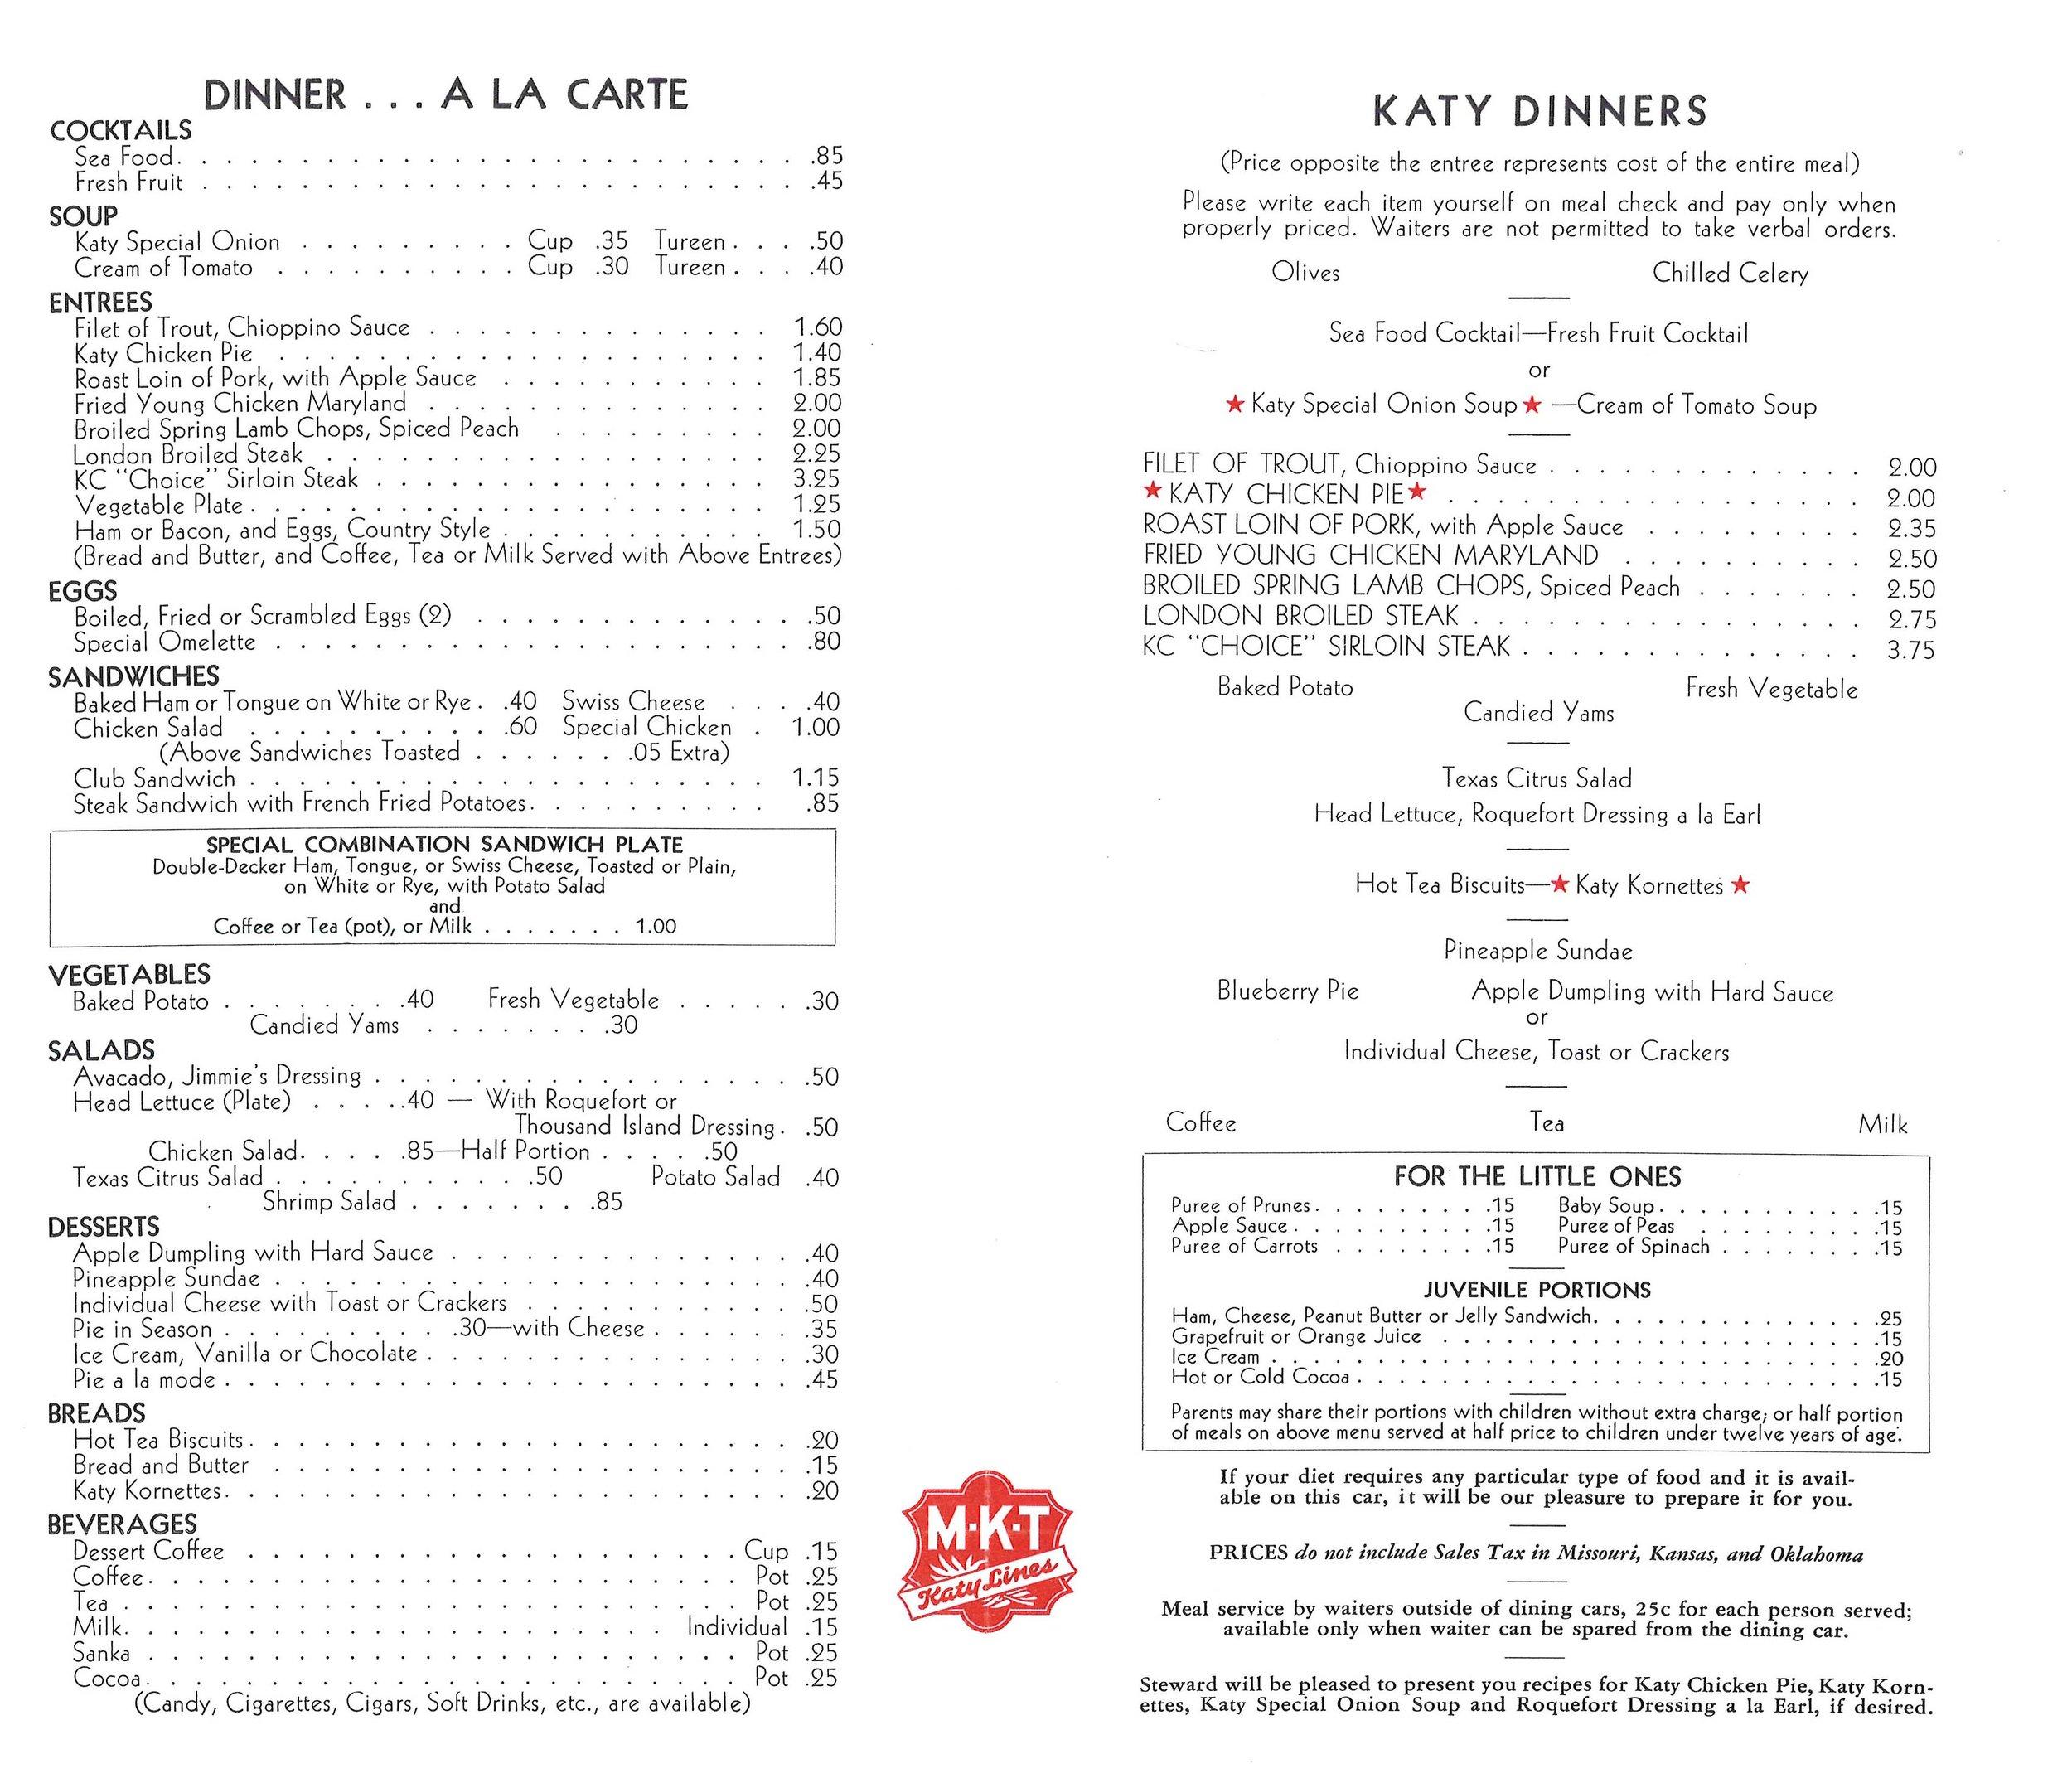 MKT+-+Katy+Lines+1949+Dinner+Menu+ 2.jpg